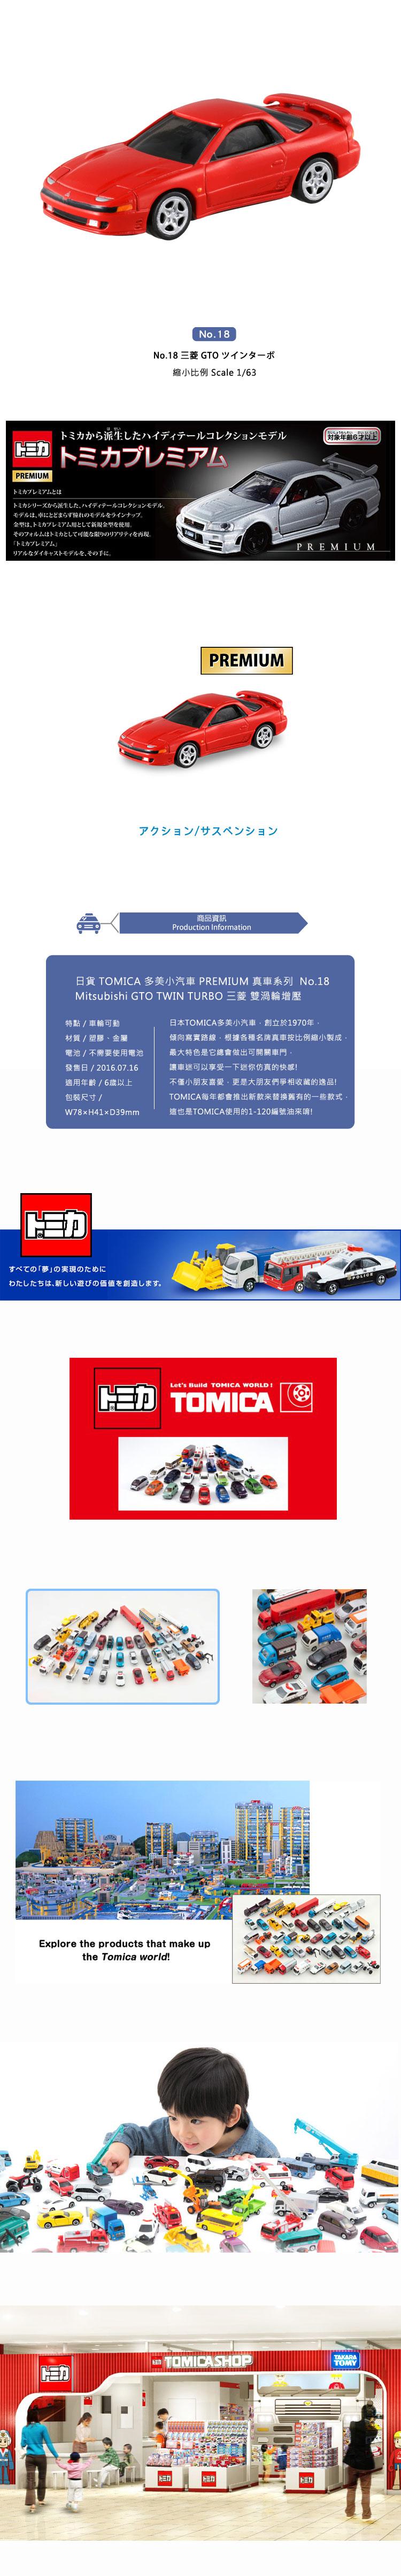 Tomica Premium No18 Mitsubishi Gto Twin Turbo 18 96